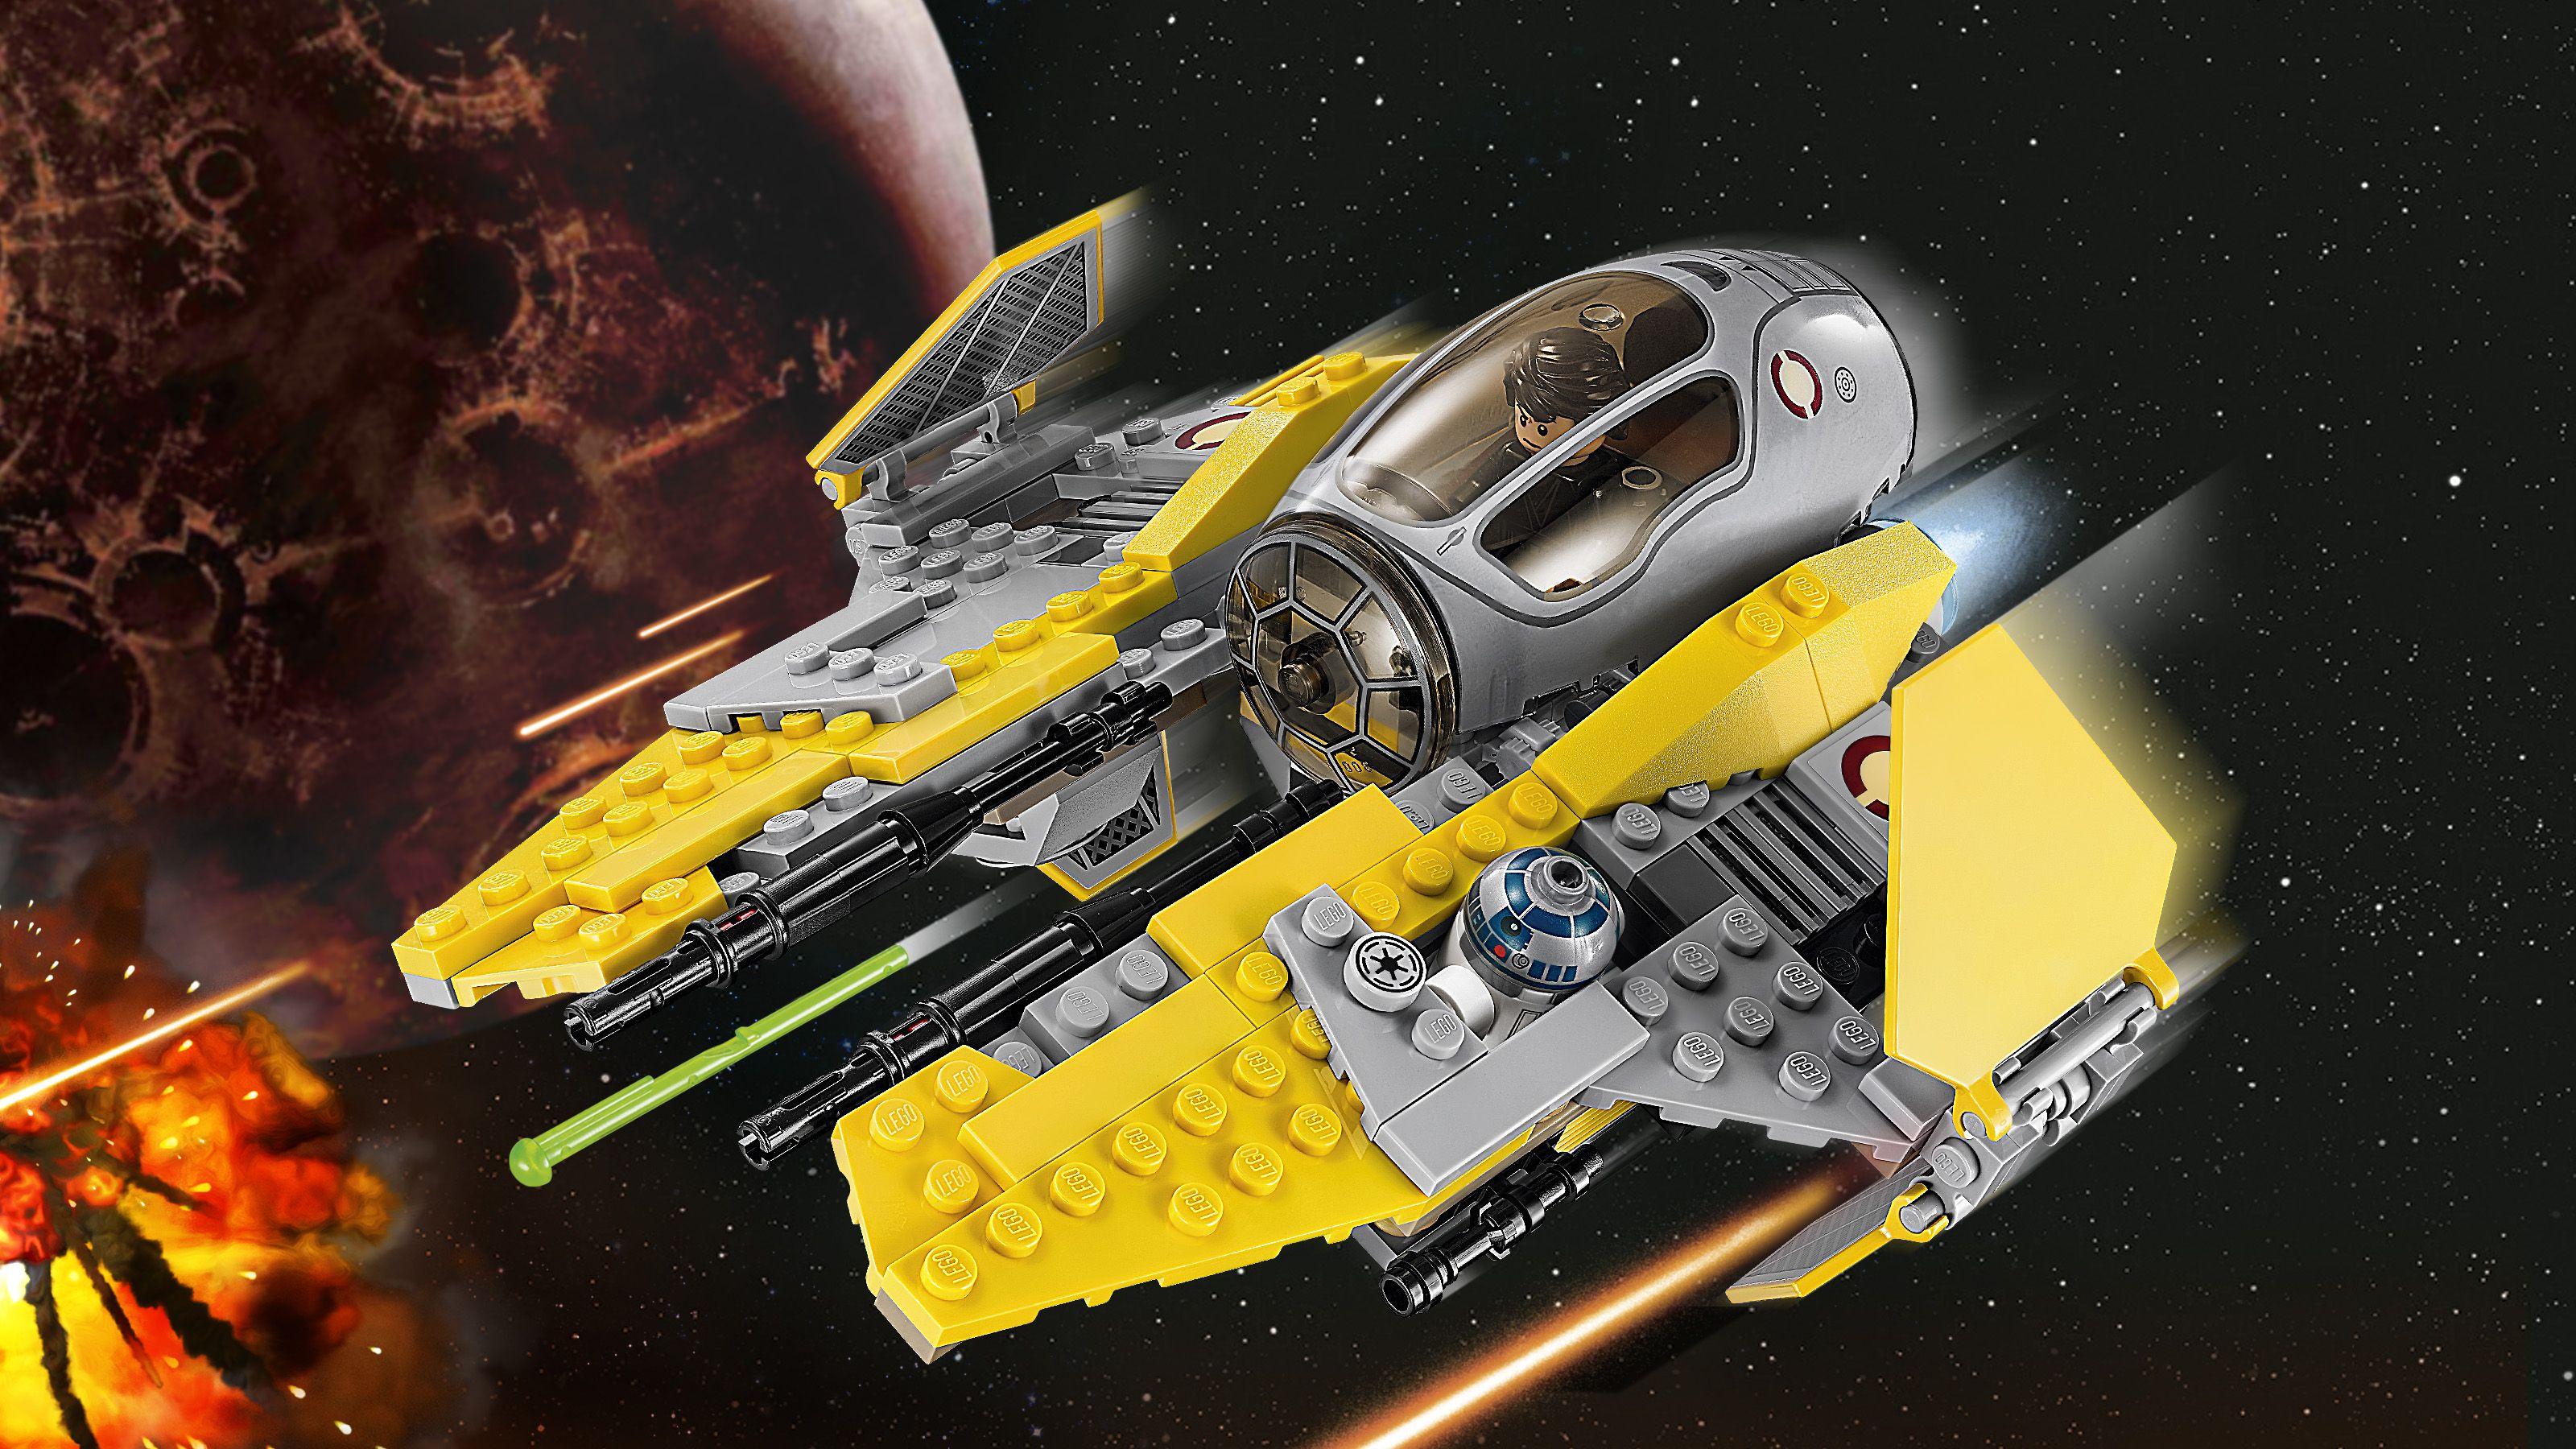 lego star wars 75038 intercepteur jedi achat vente assemblage construction cdiscount. Black Bedroom Furniture Sets. Home Design Ideas